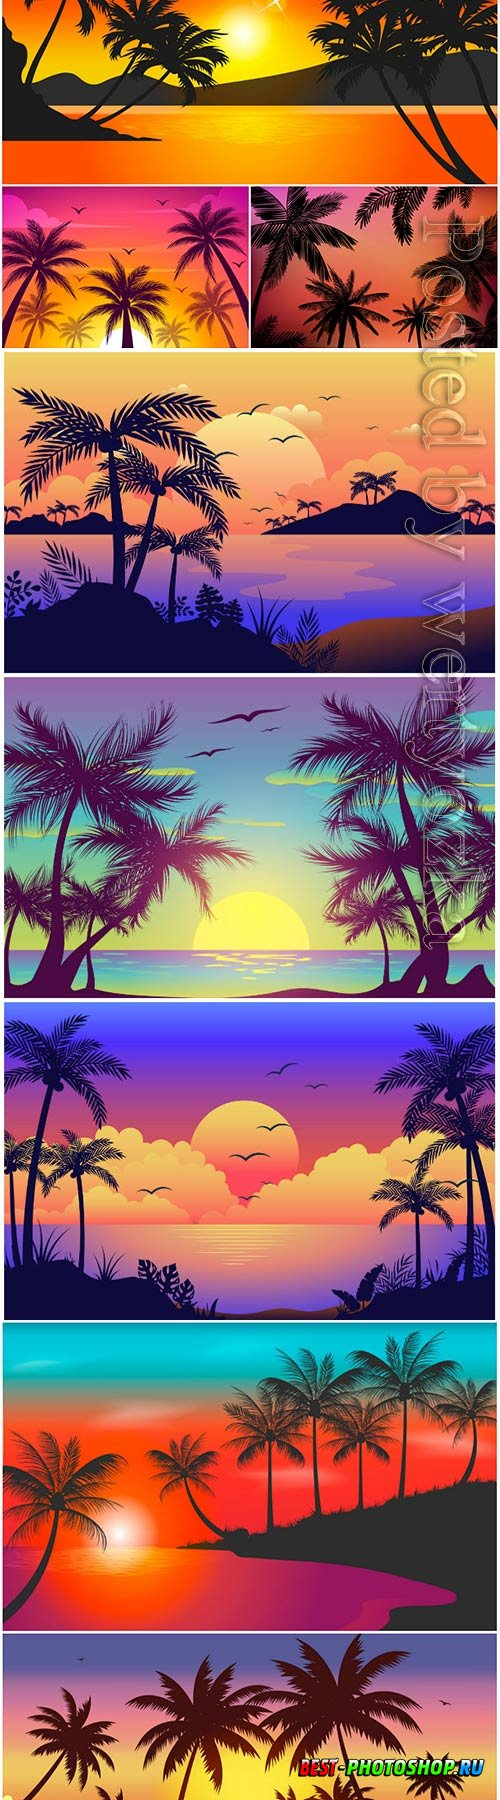 Colorful palm silhouettes wallpaper concept vector design